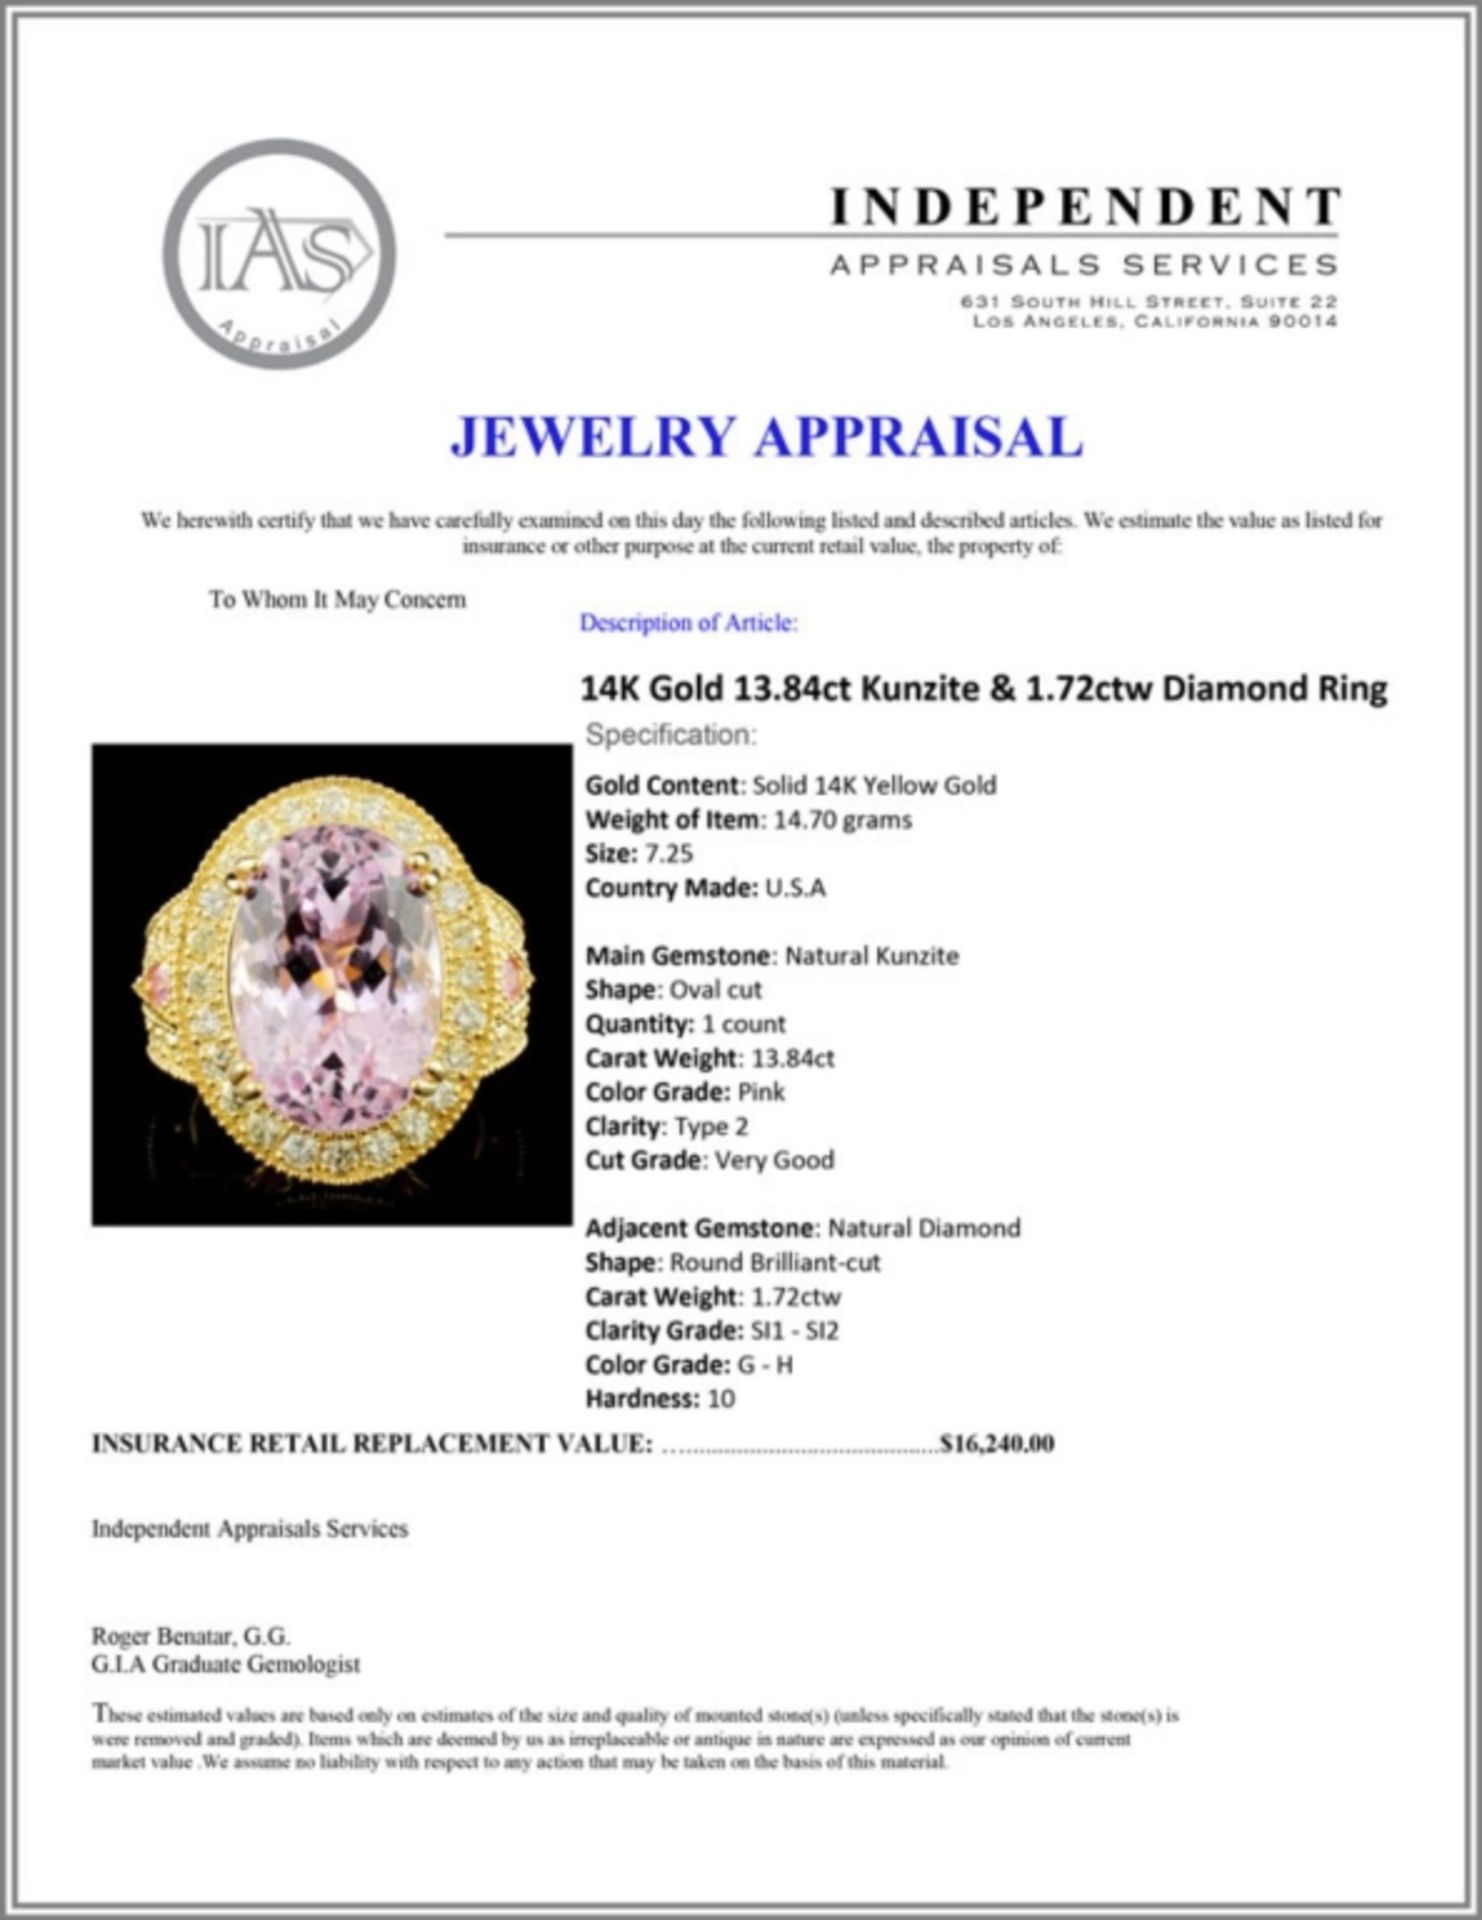 14K Gold 13.84ct Kunzite & 1.72ctw Diamond Ring - Image 5 of 5